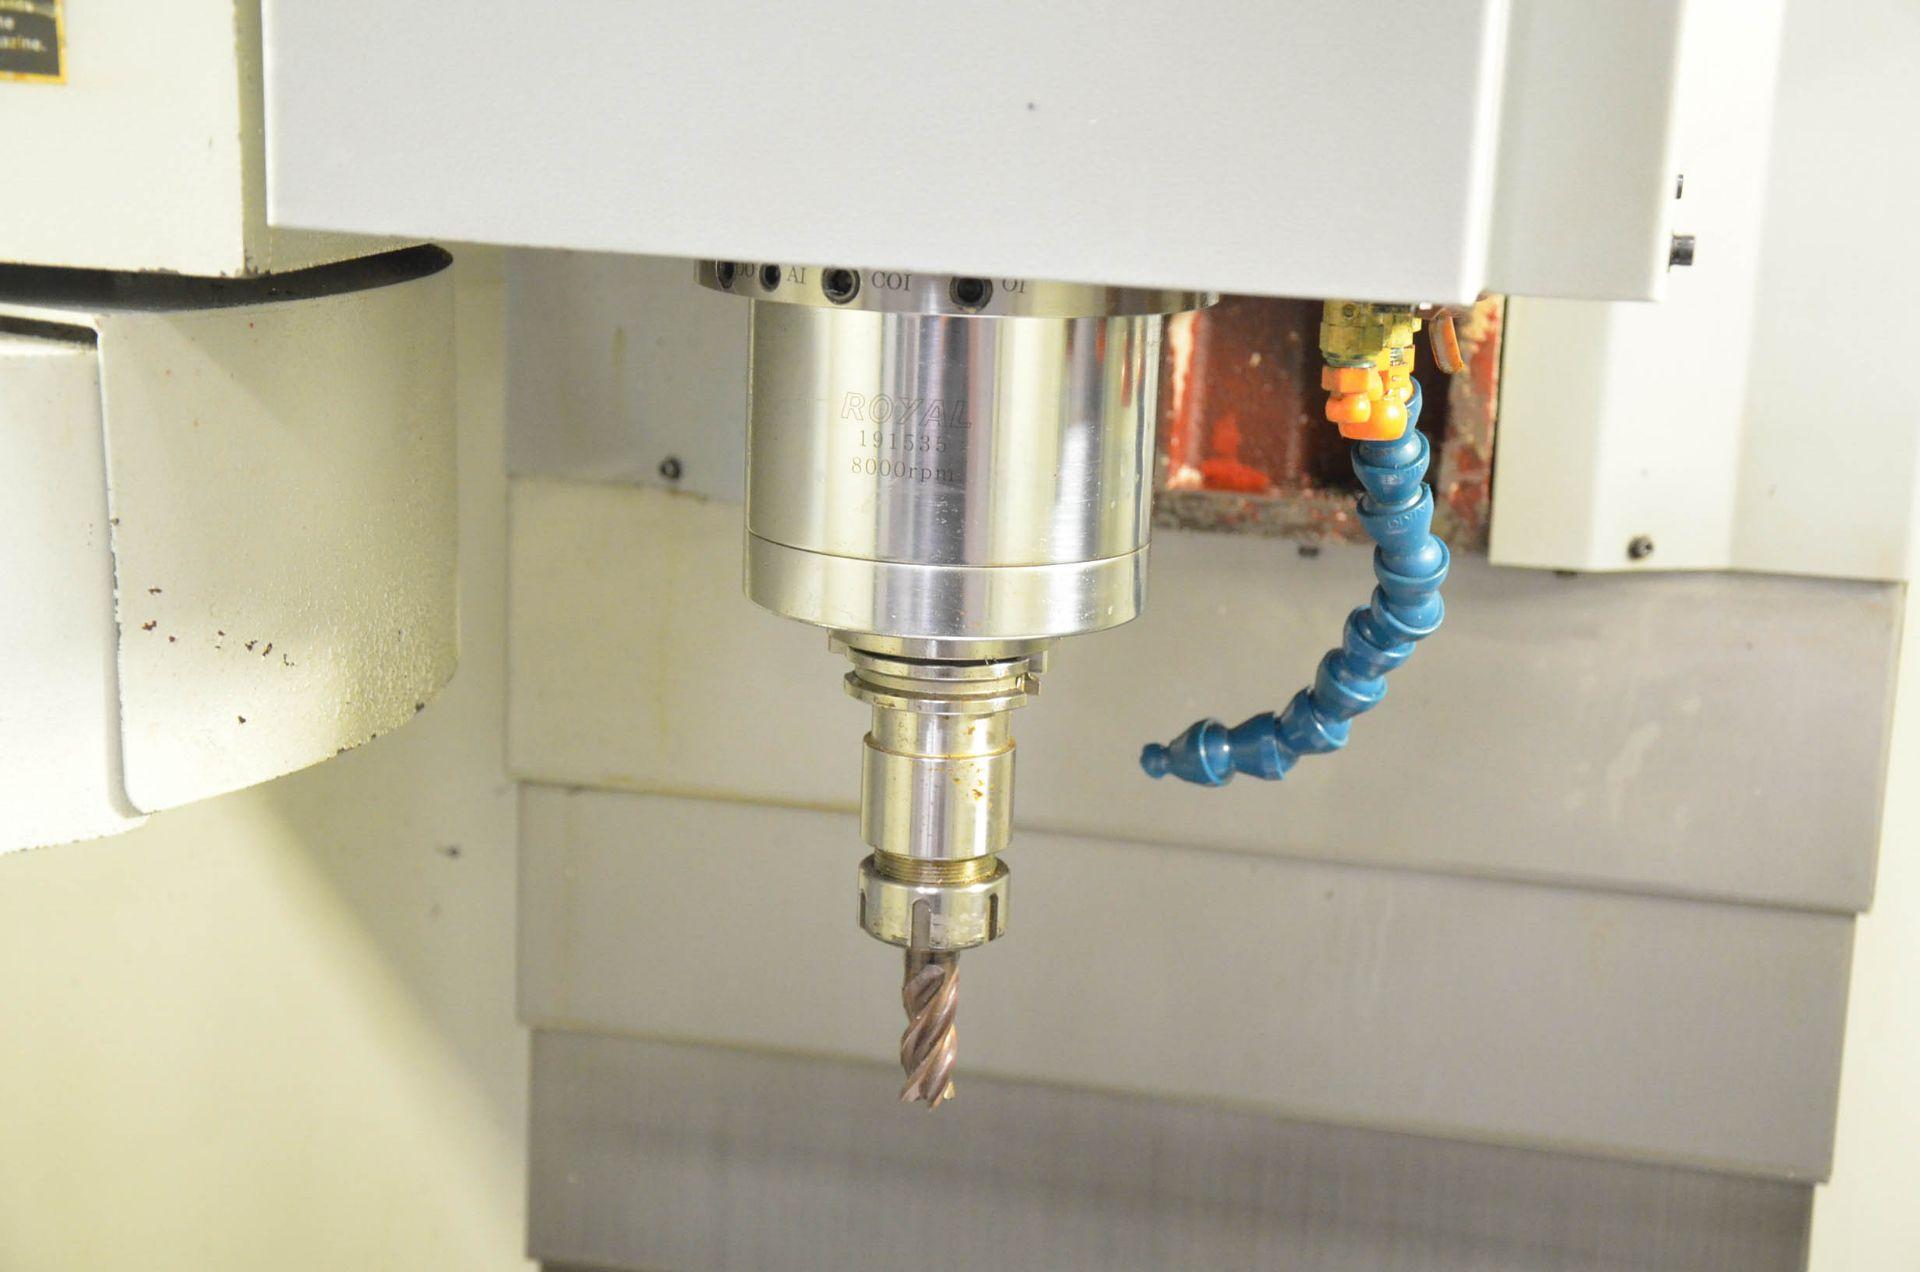 "SWI (2013) TRAK LPM CNC VERTICAL MACHINING CENTER WITH PROTO TRAK PMX CNC CONTROL, 19.5"" X 35.5"" - Image 8 of 9"